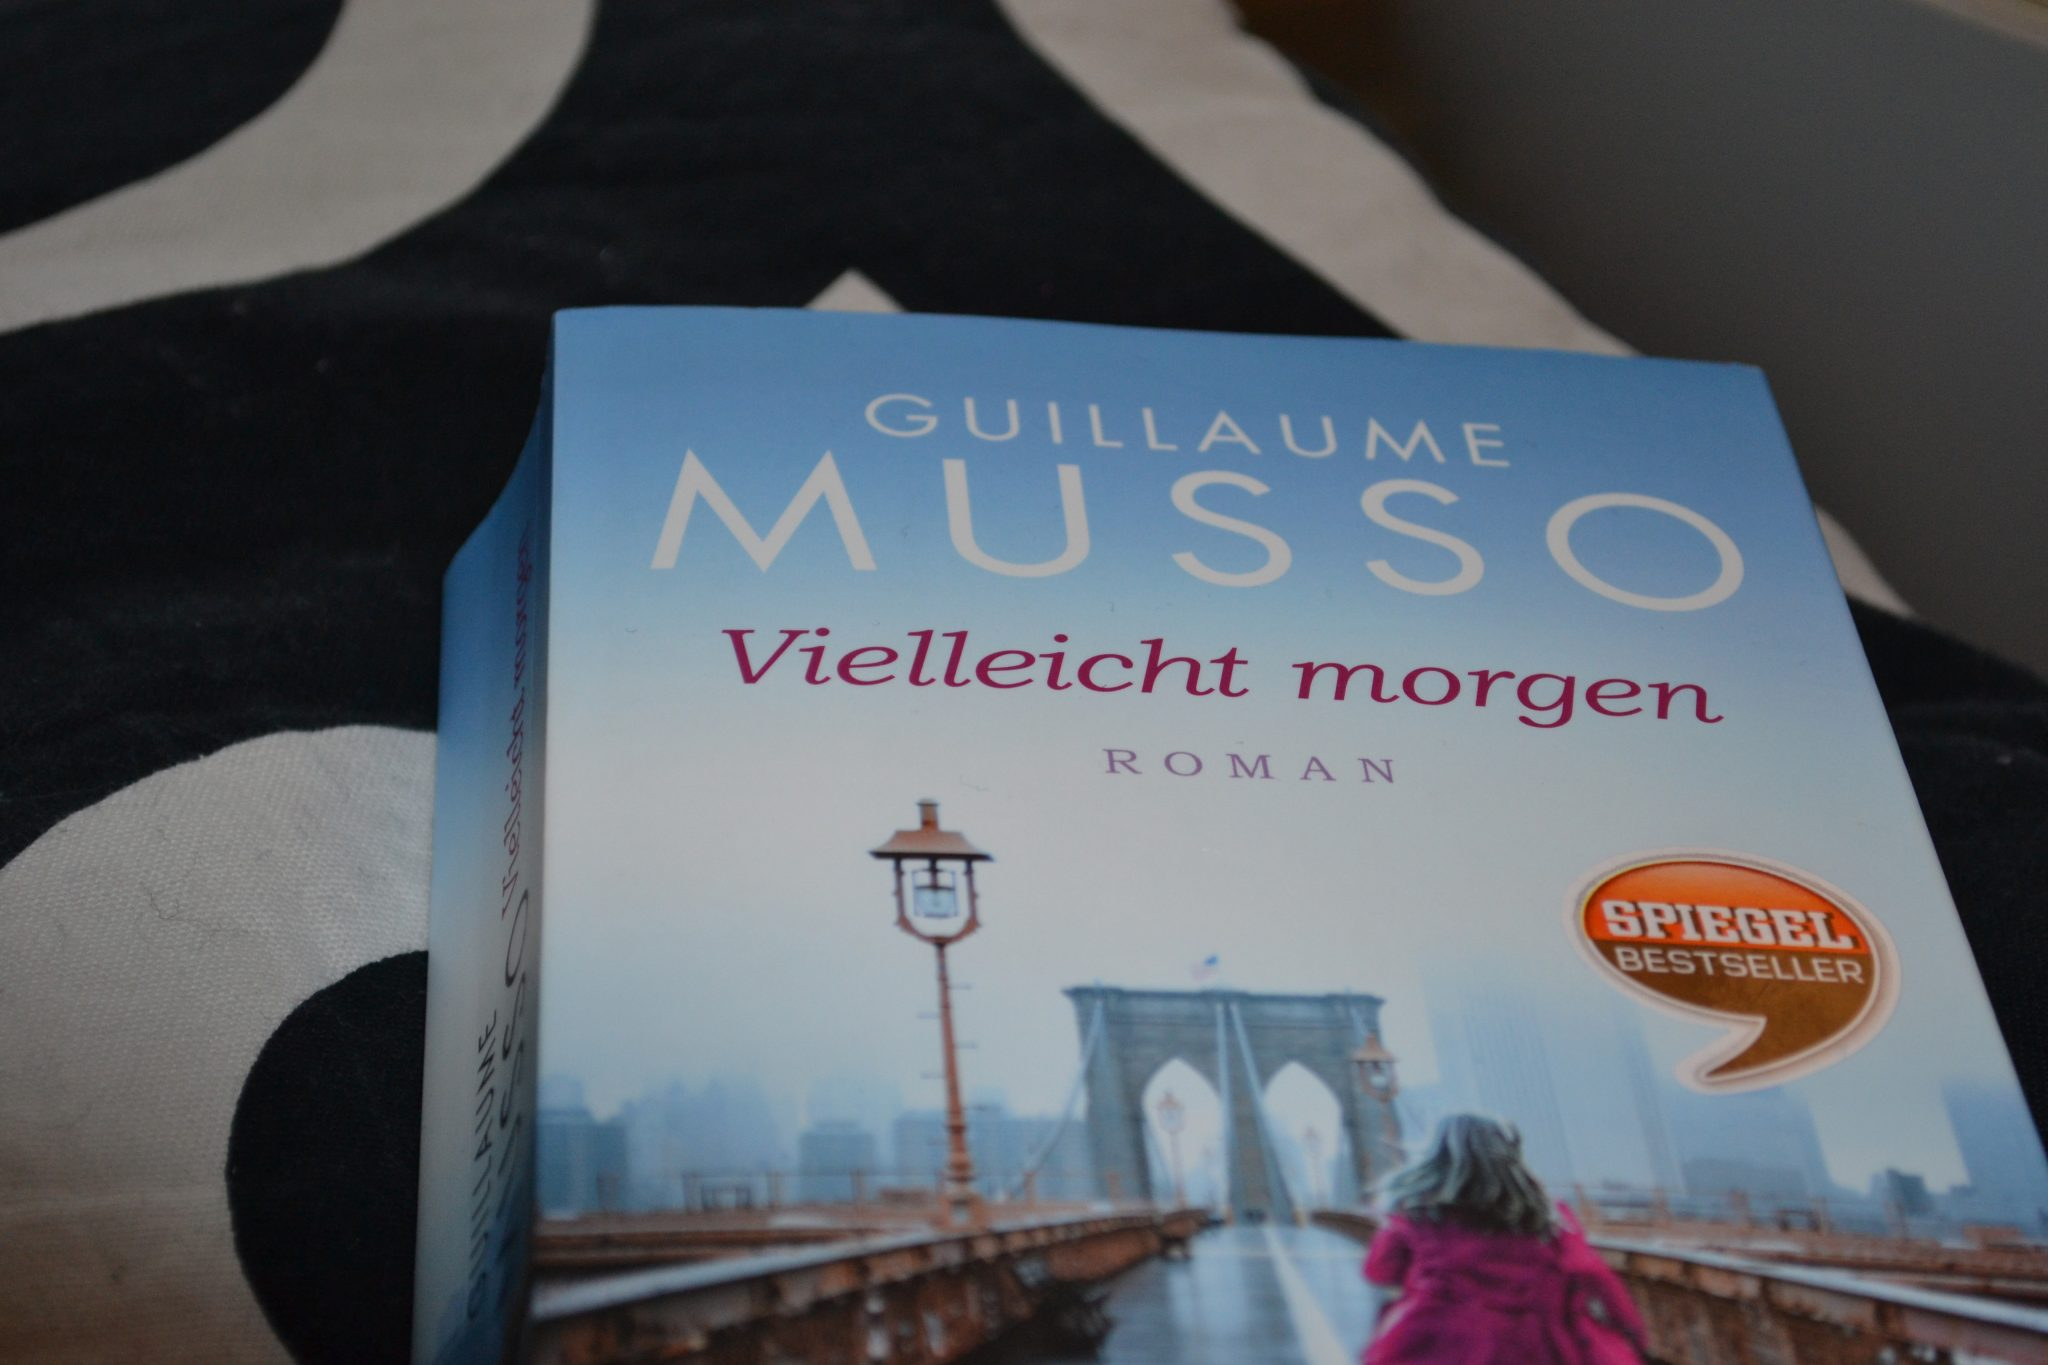 Books: Vielleicht morgen | Guillaume Musso - DSC 0013